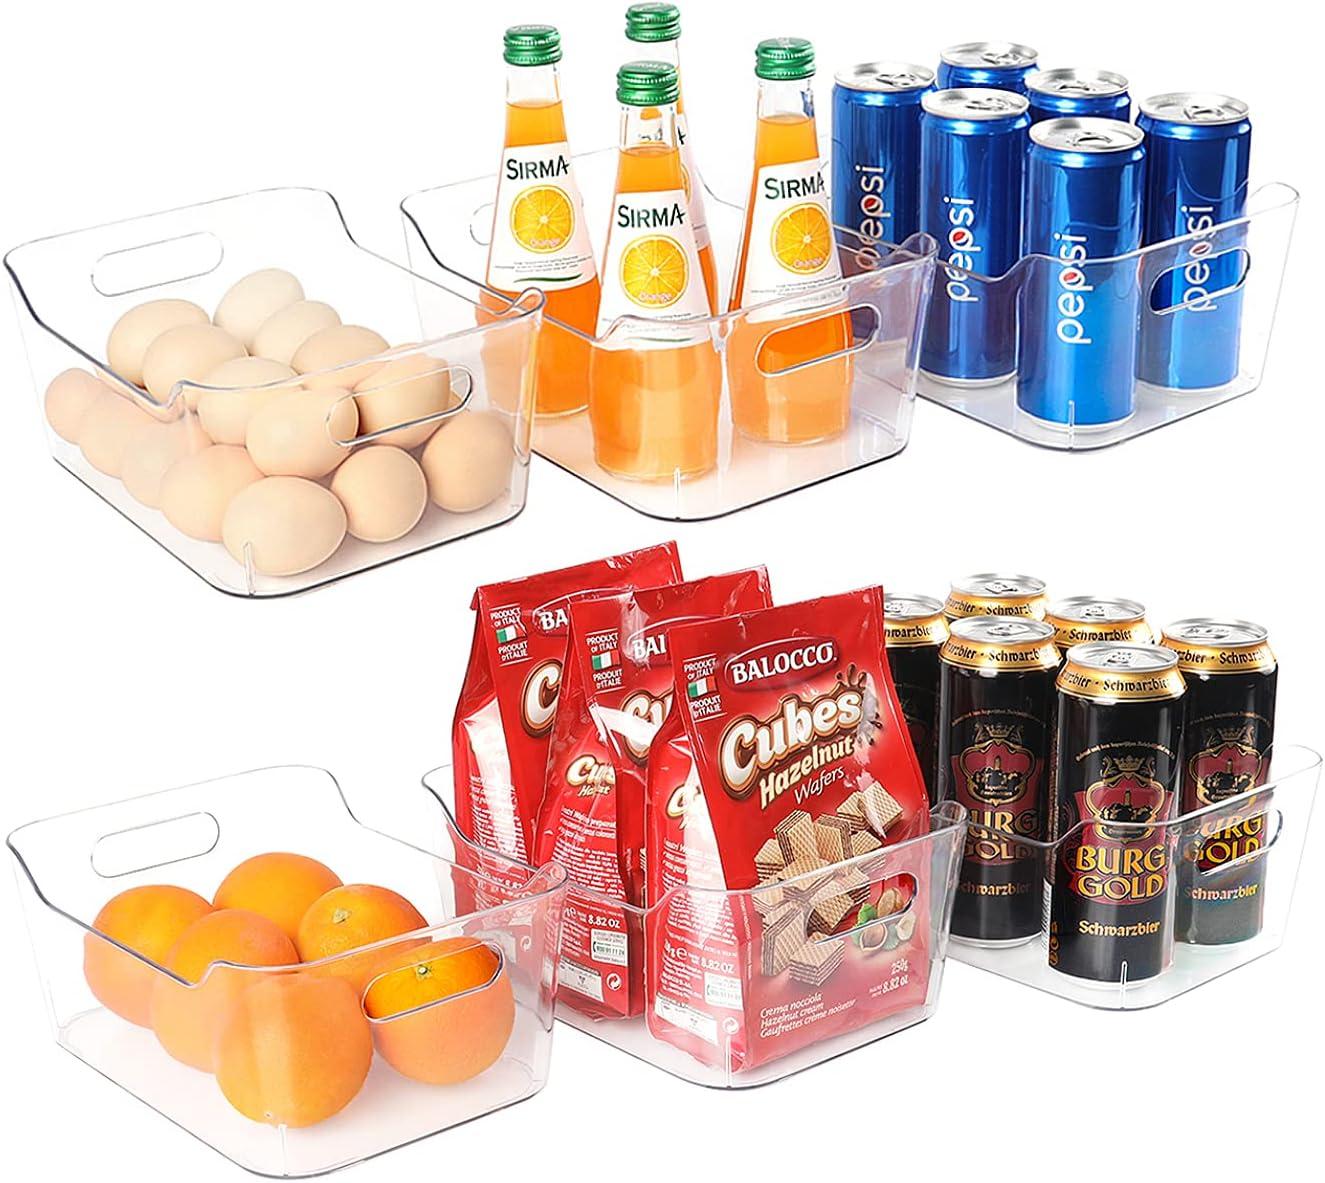 Set of 6 Refrigerator Organizer Bins, Pantry Organization and Storage, Clear Plastic Stackable Food Storage Bins with Handles, for Refrigerator, Freezer, Cabinet, Kitchen, BPA Free